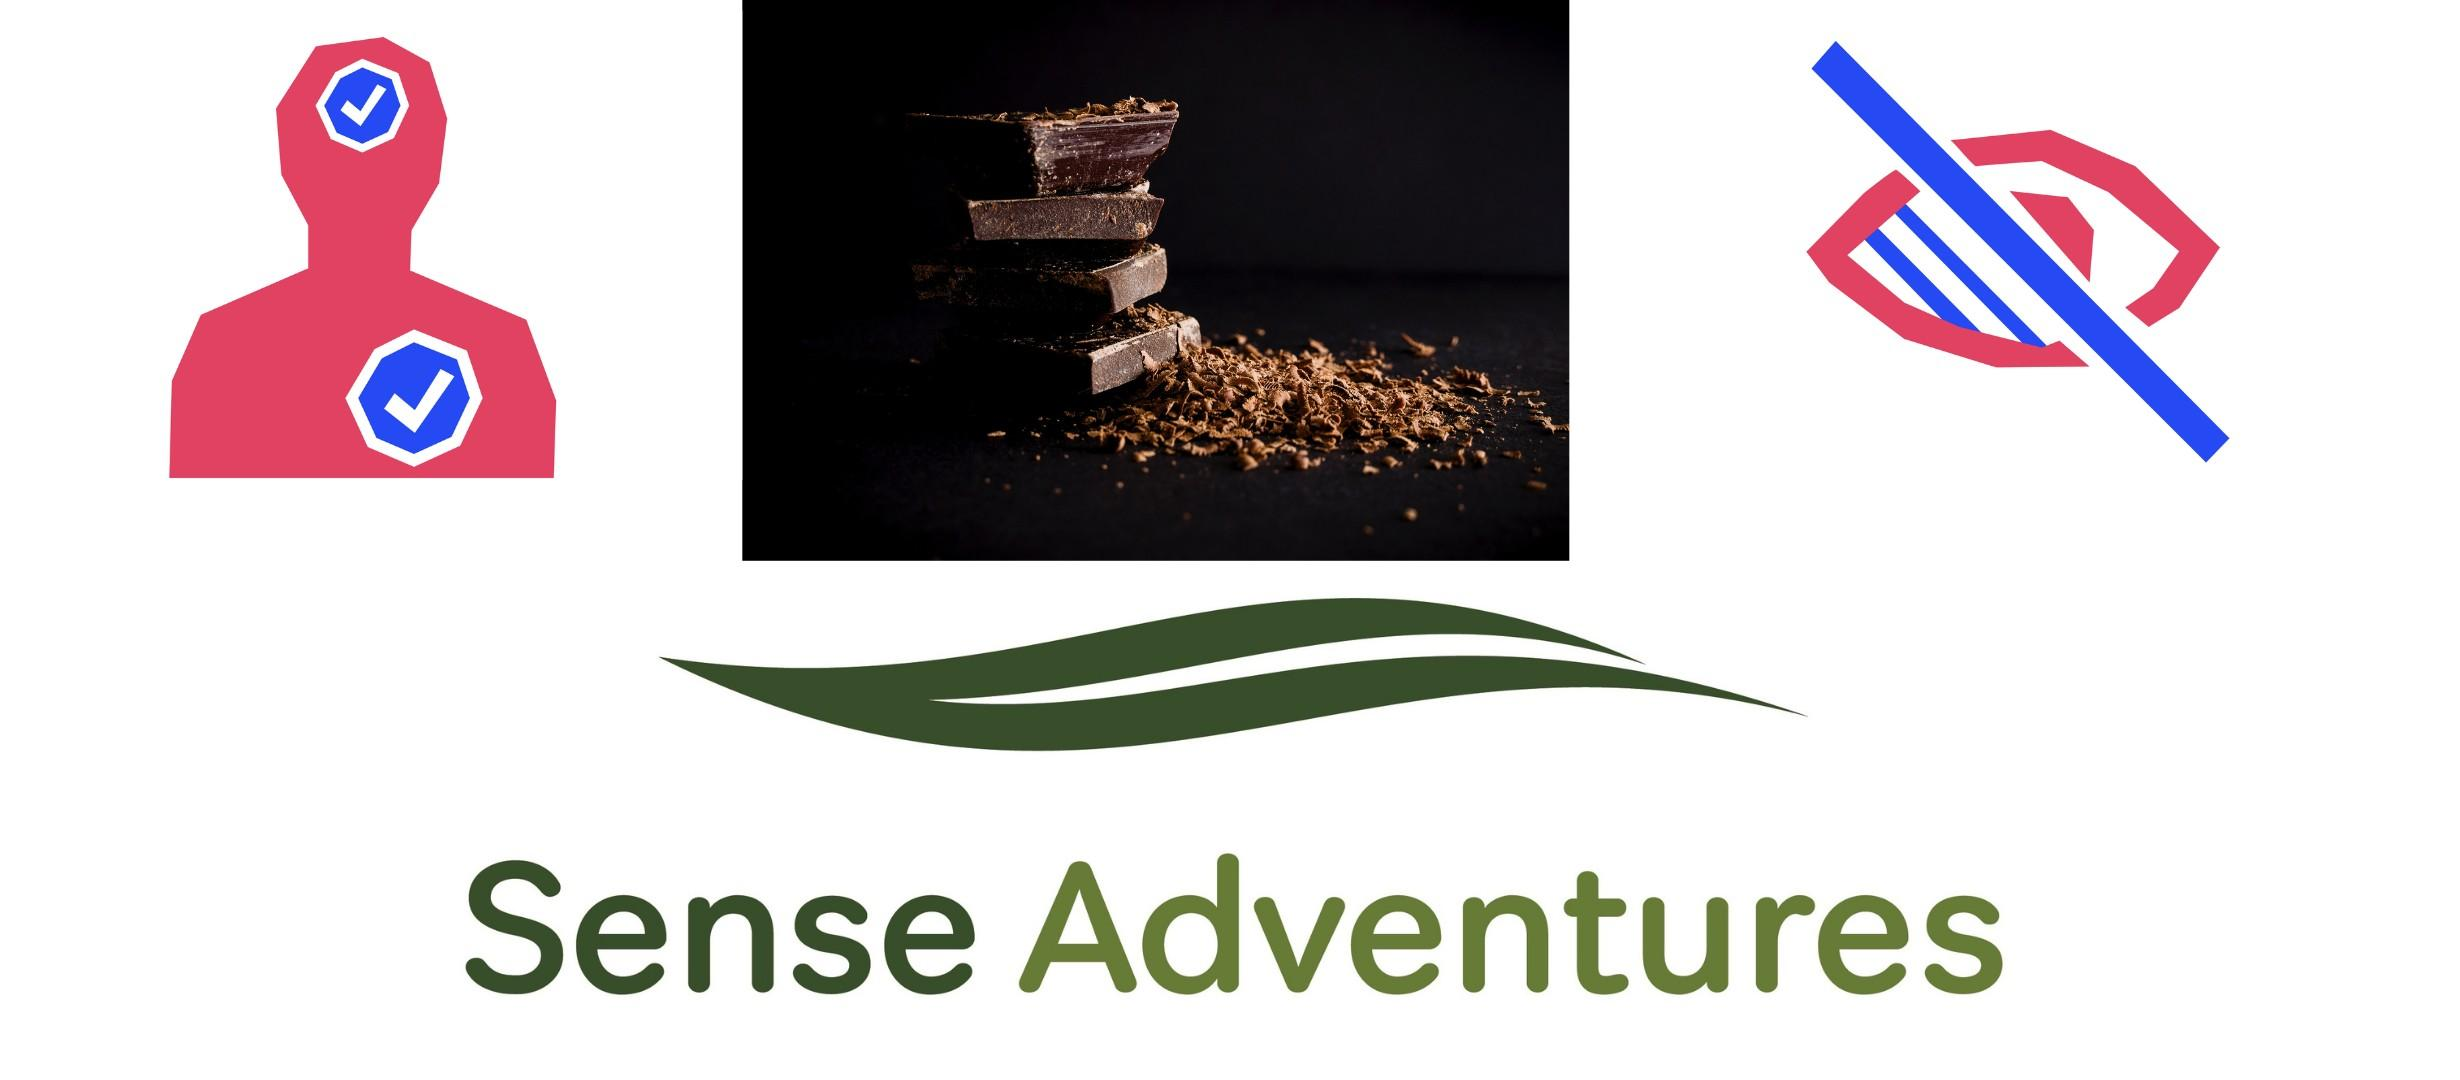 banner for sense adventures chocolate making